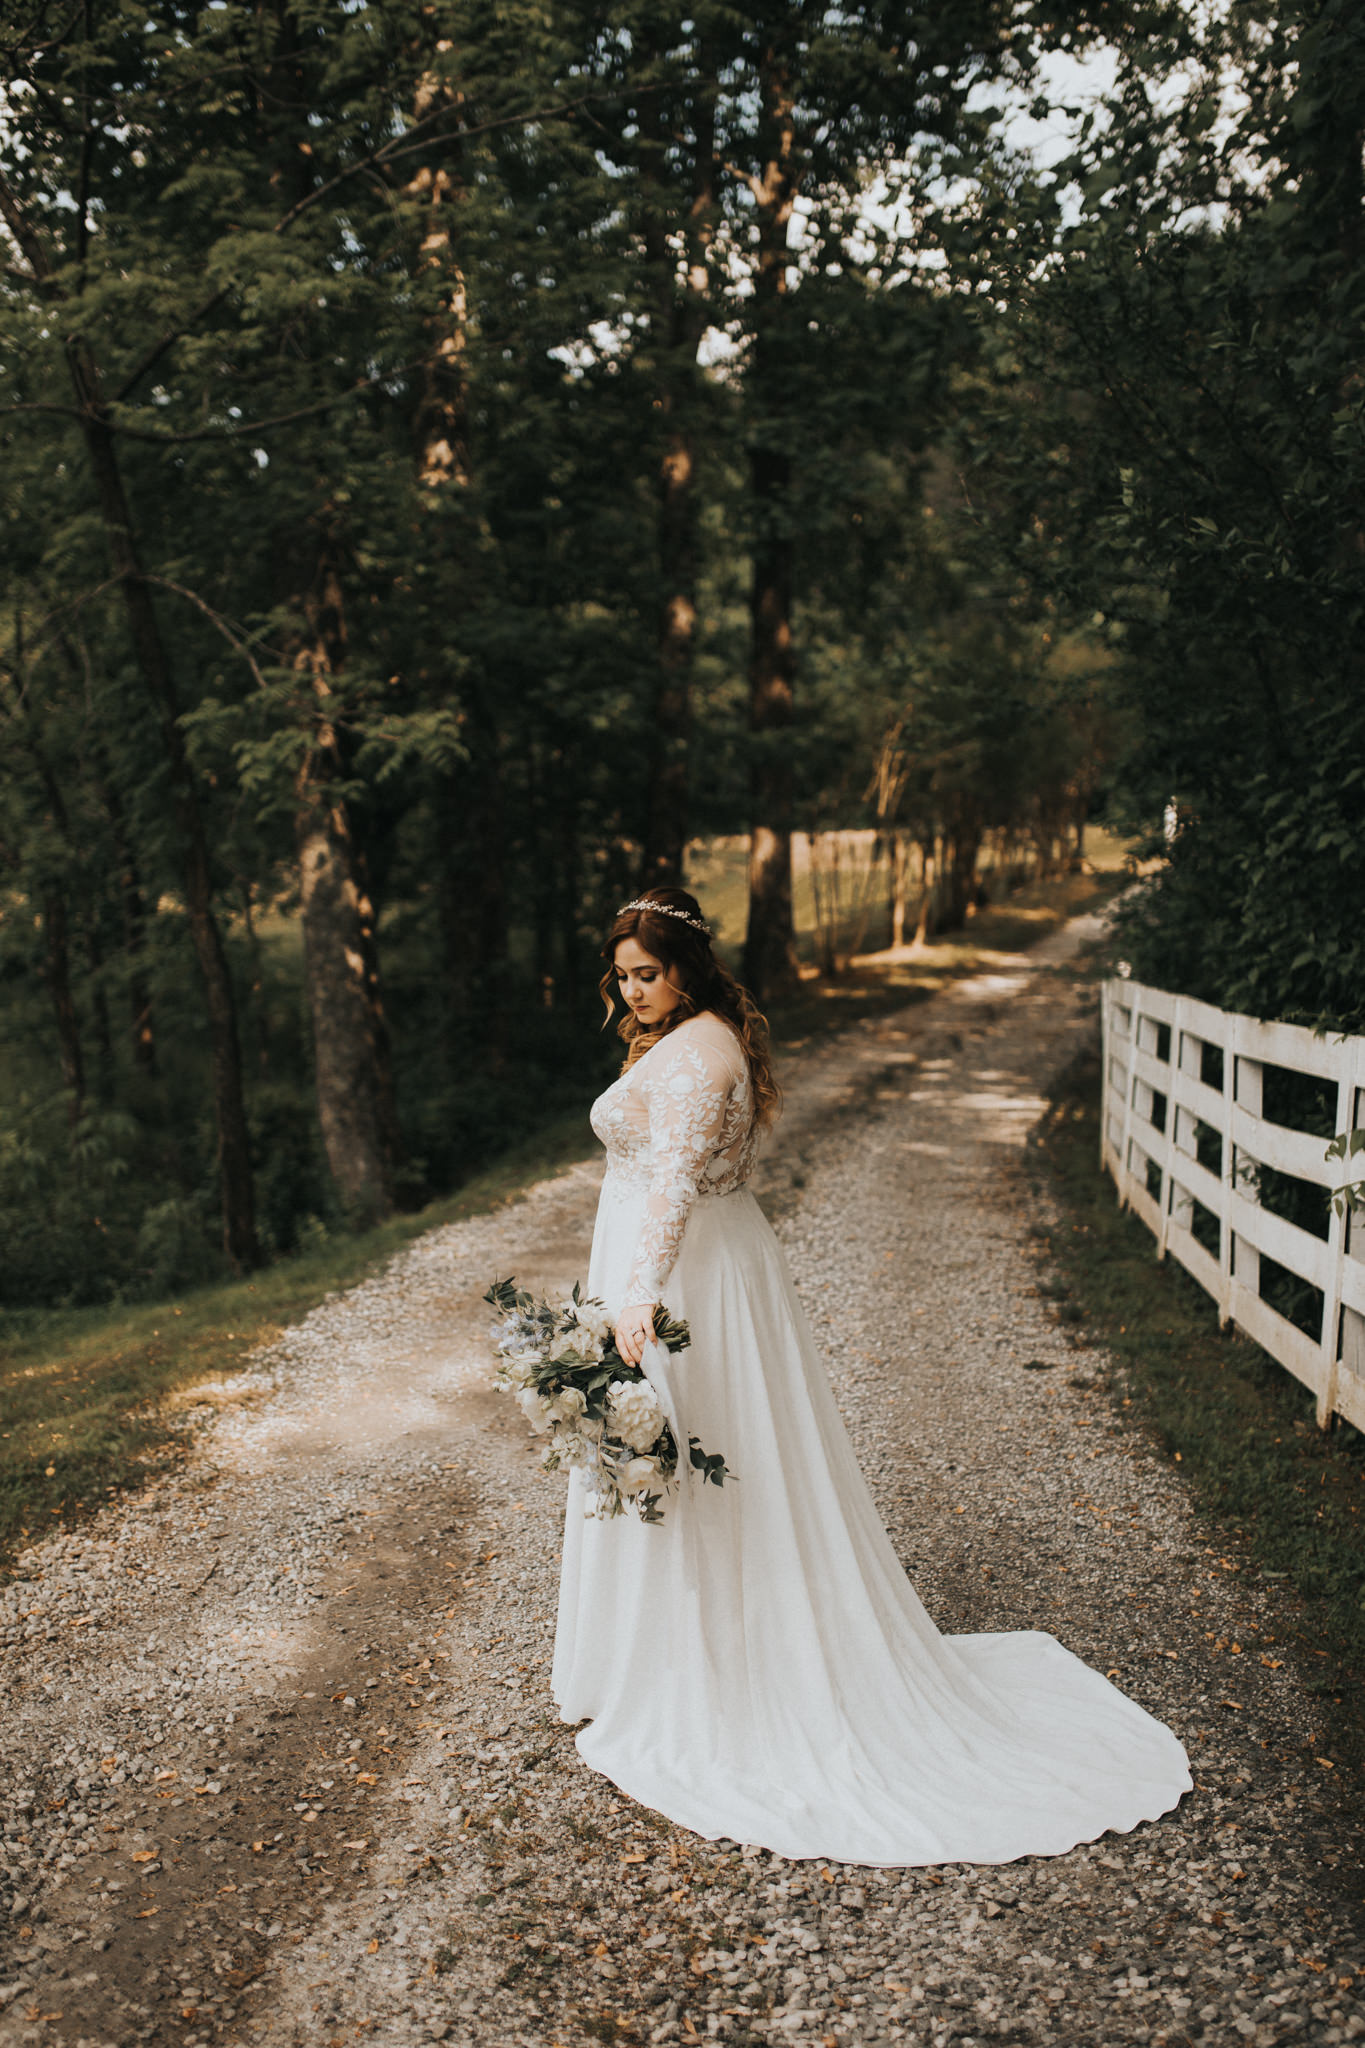 KateMatt-North-Georgia-Wedding-Photographer-Mountain-Laurel-Farm-59.jpg